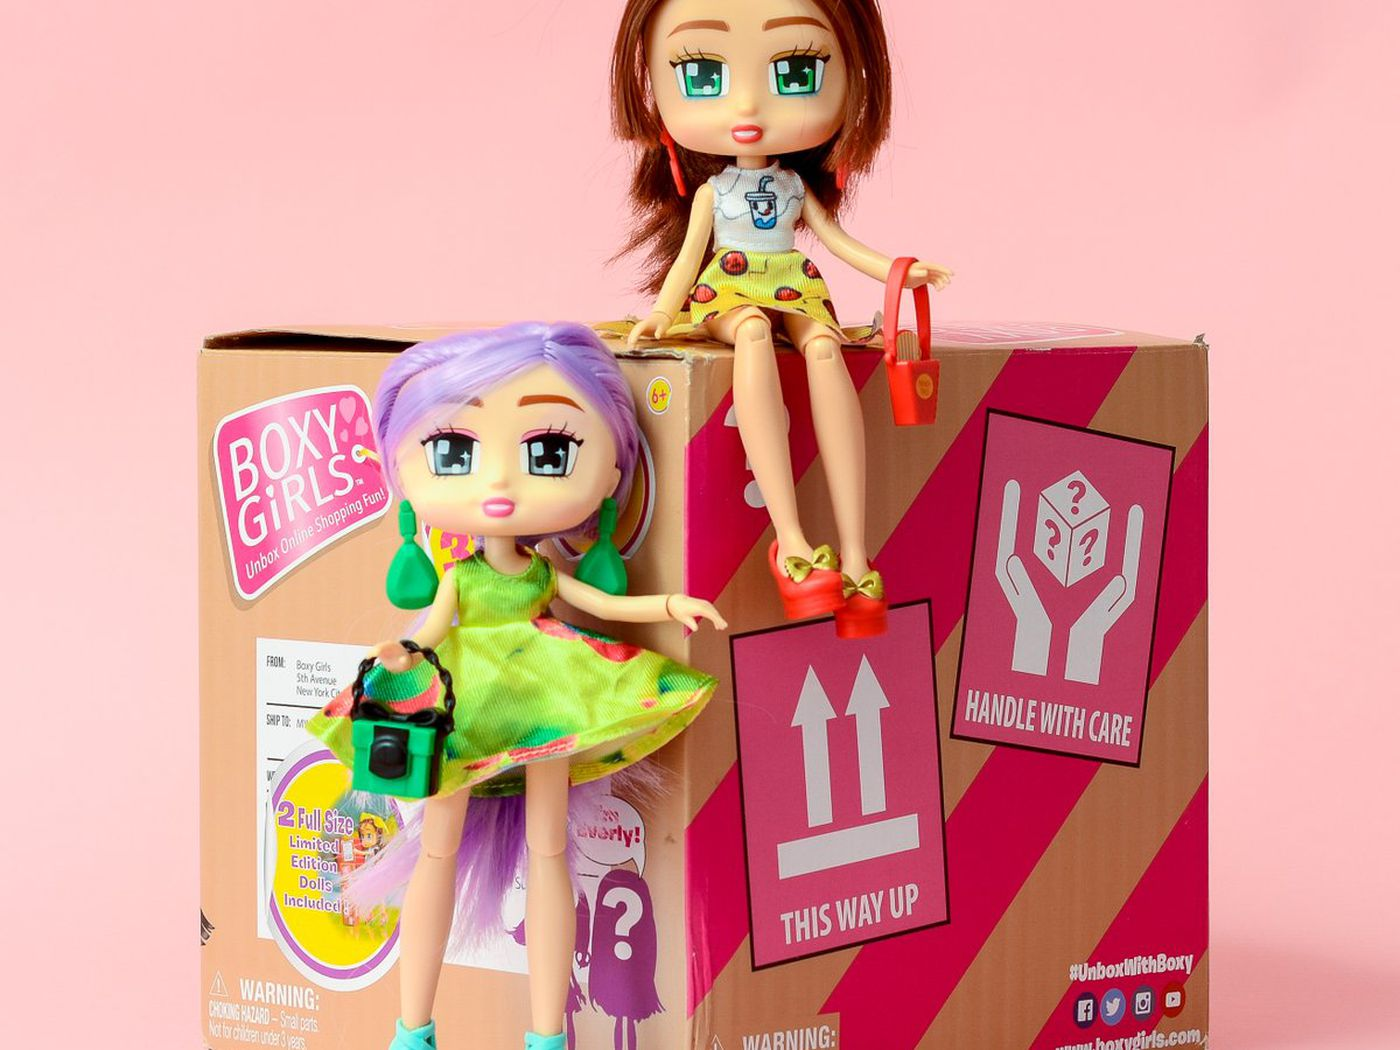 BOXY GIRLS NOMI 12 Fashion Surprises /& 1 Fashion Pack Unbox 20 Fashions 2018 Toy